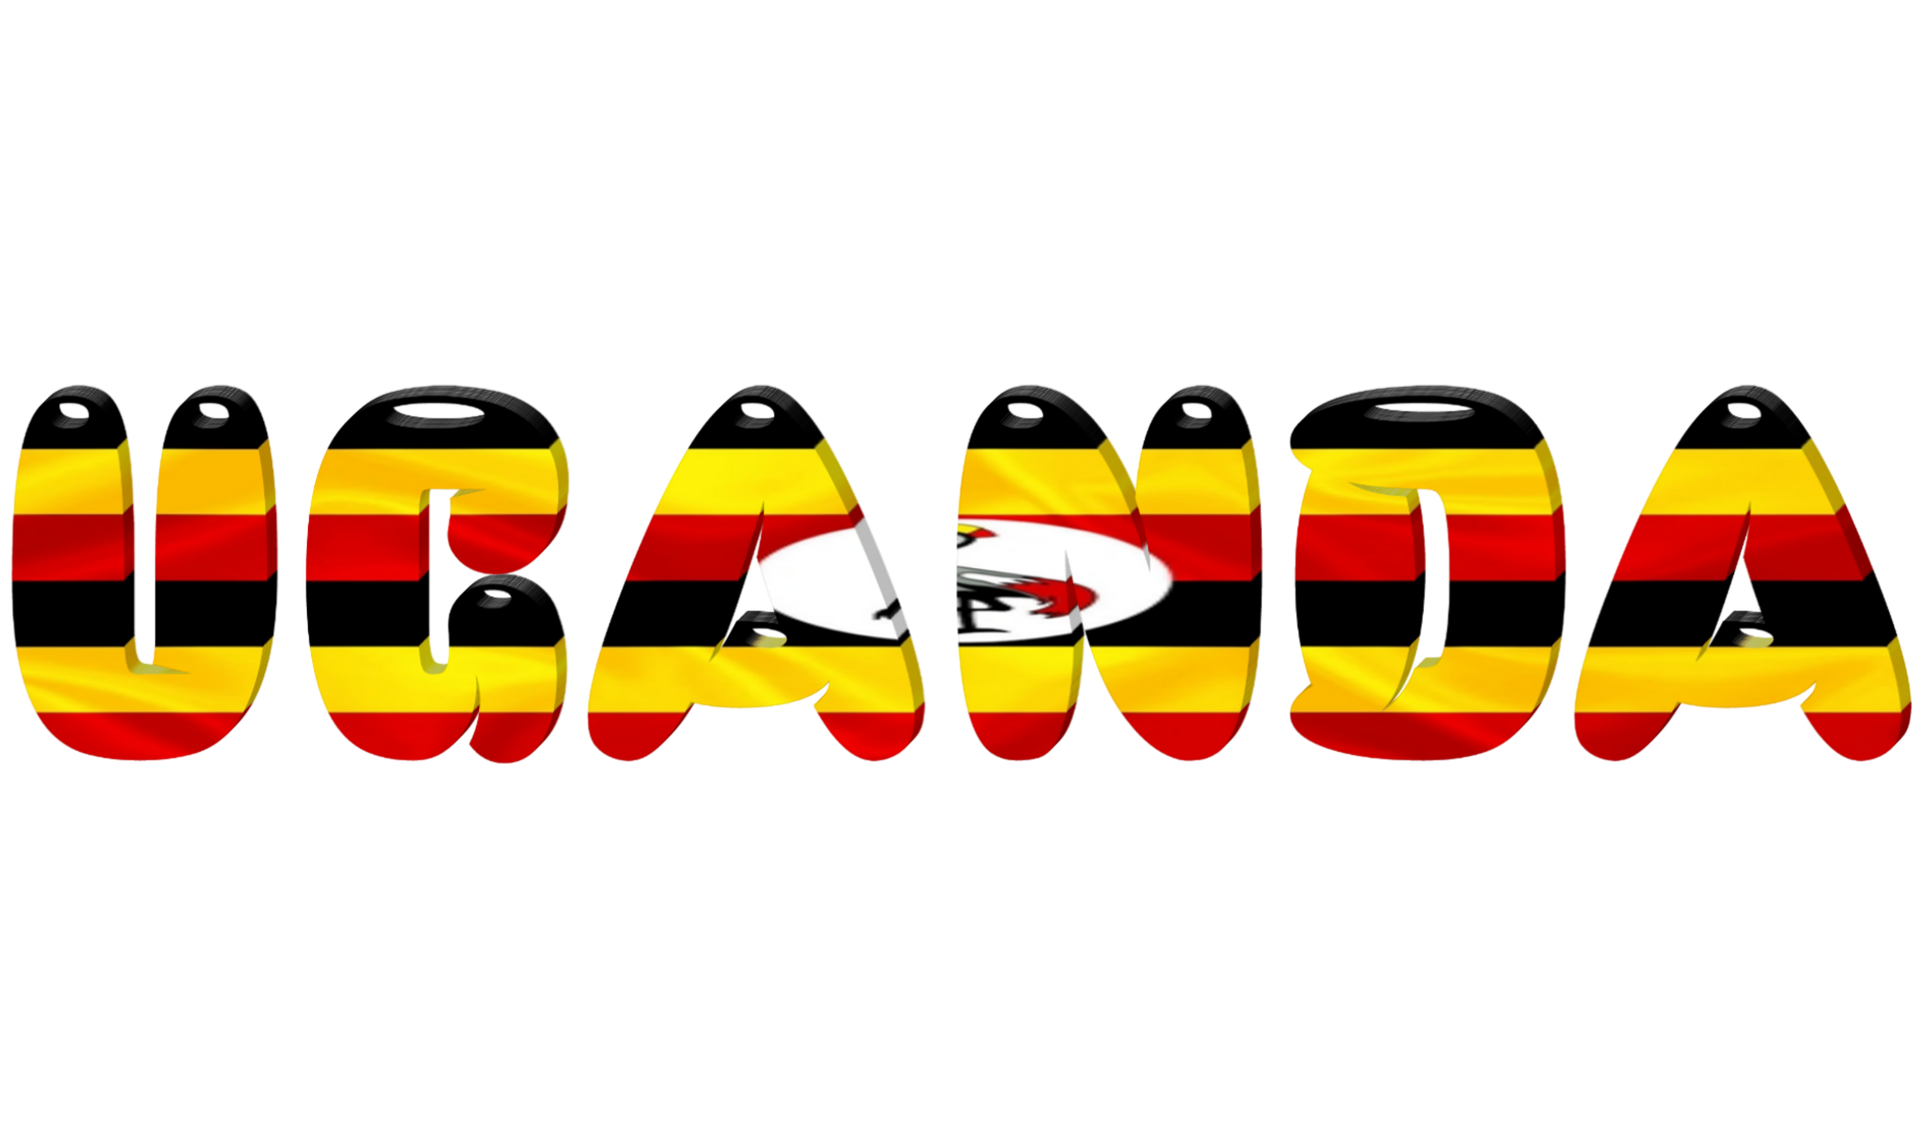 Cheap calls to Uganda